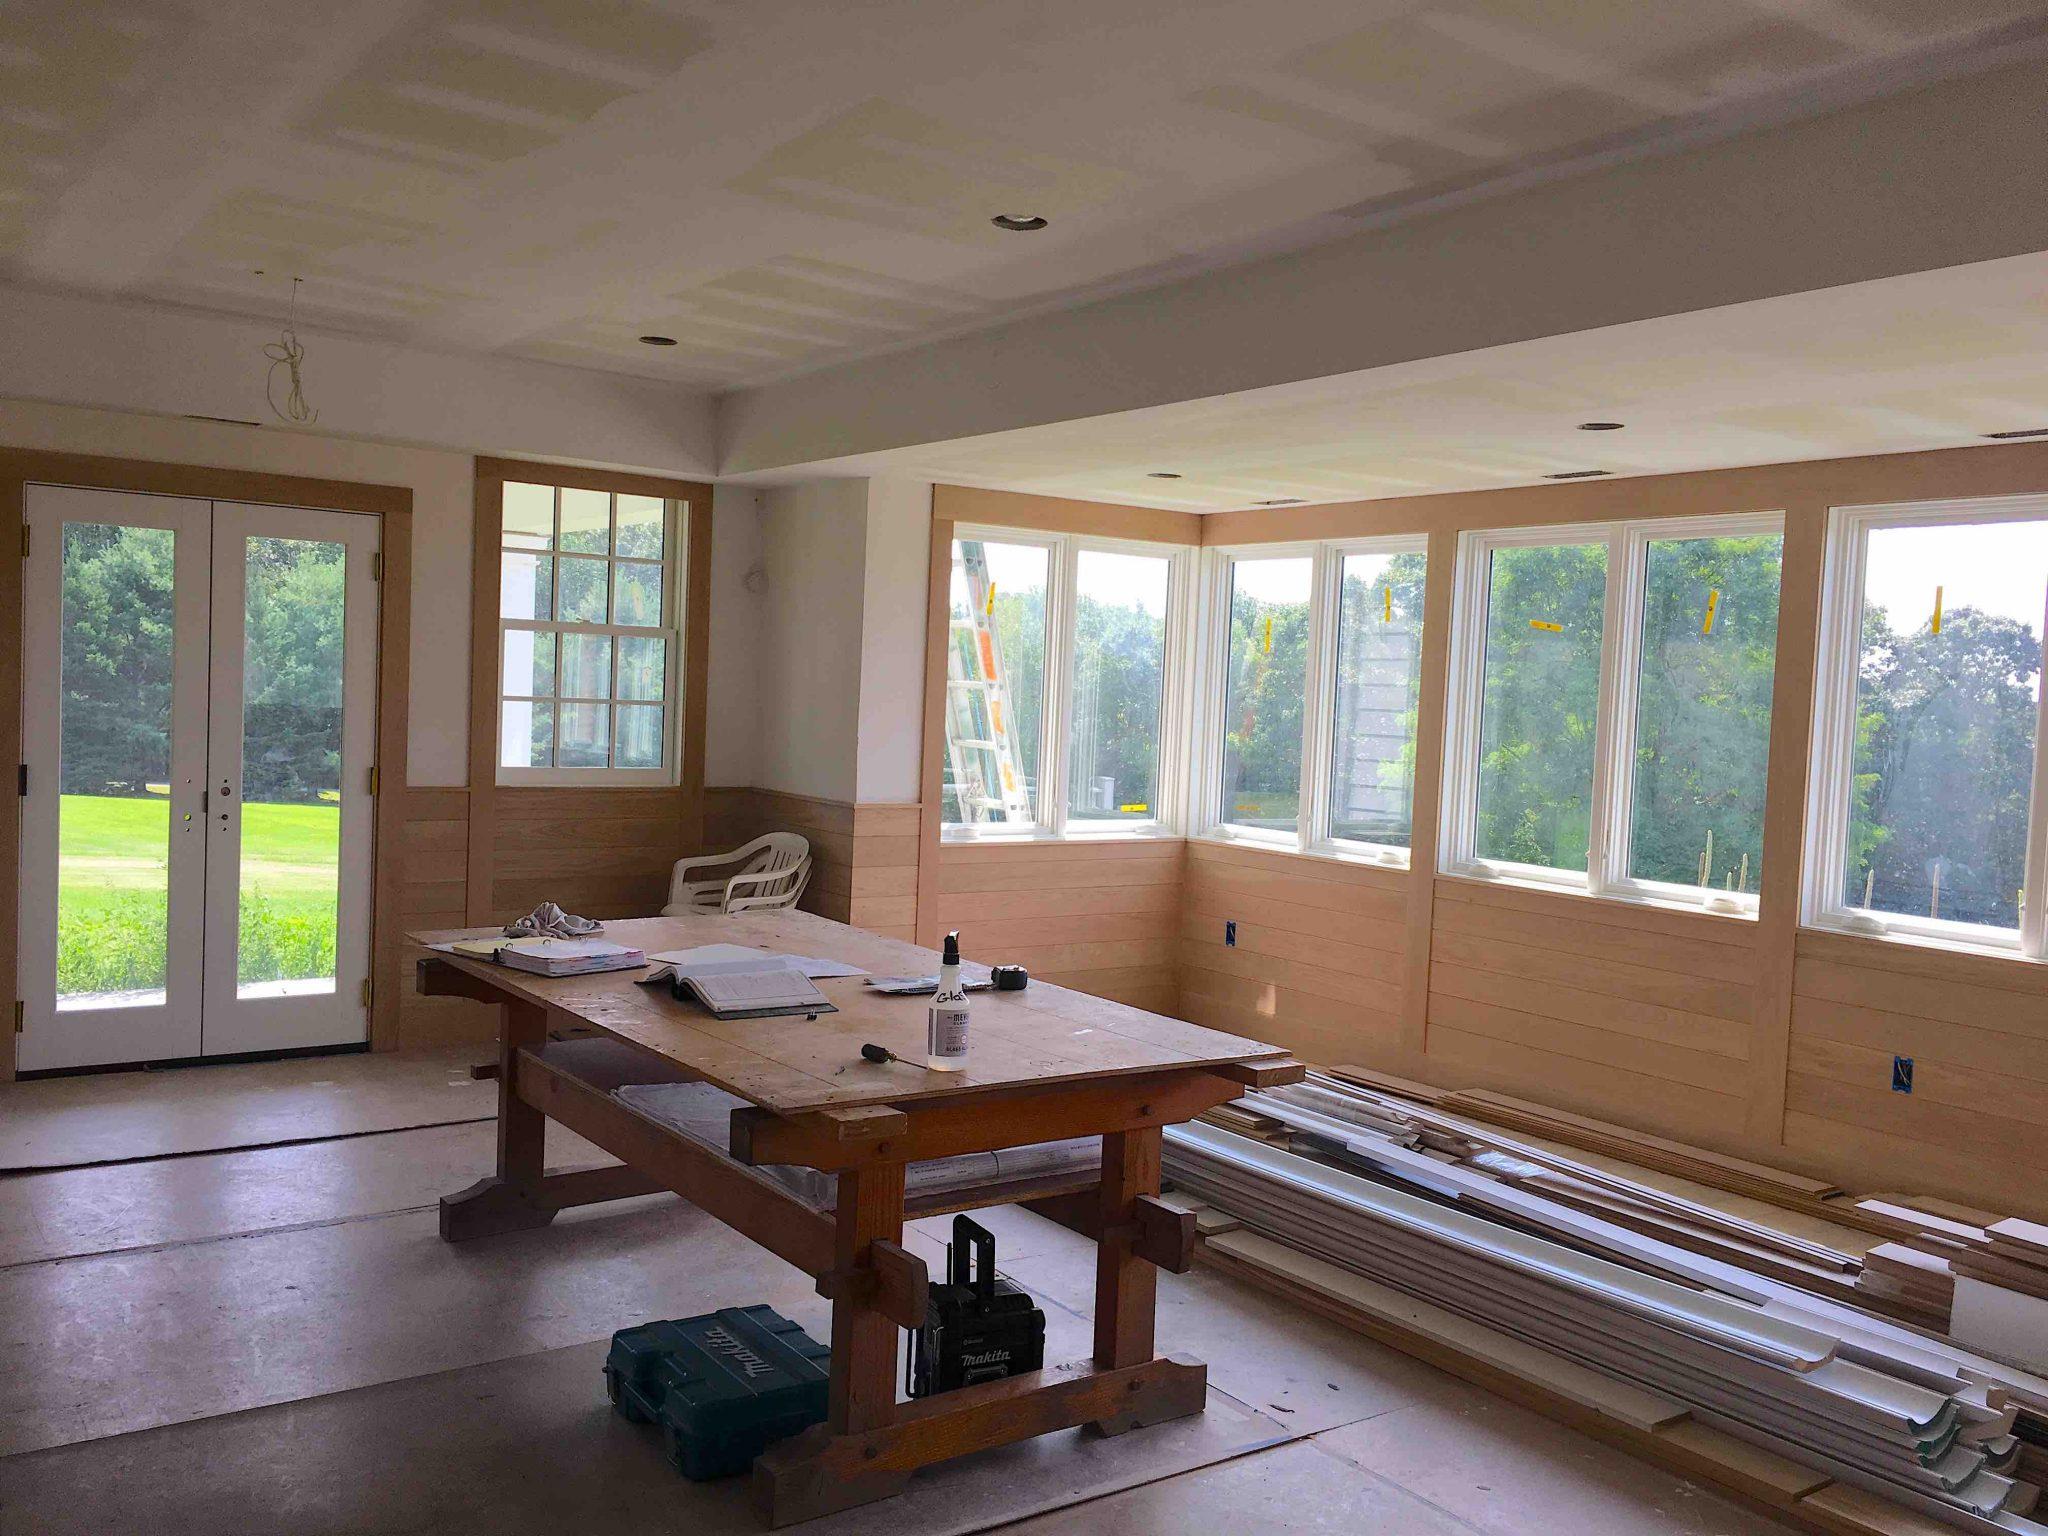 Gym - Dutchess County Home Renovation